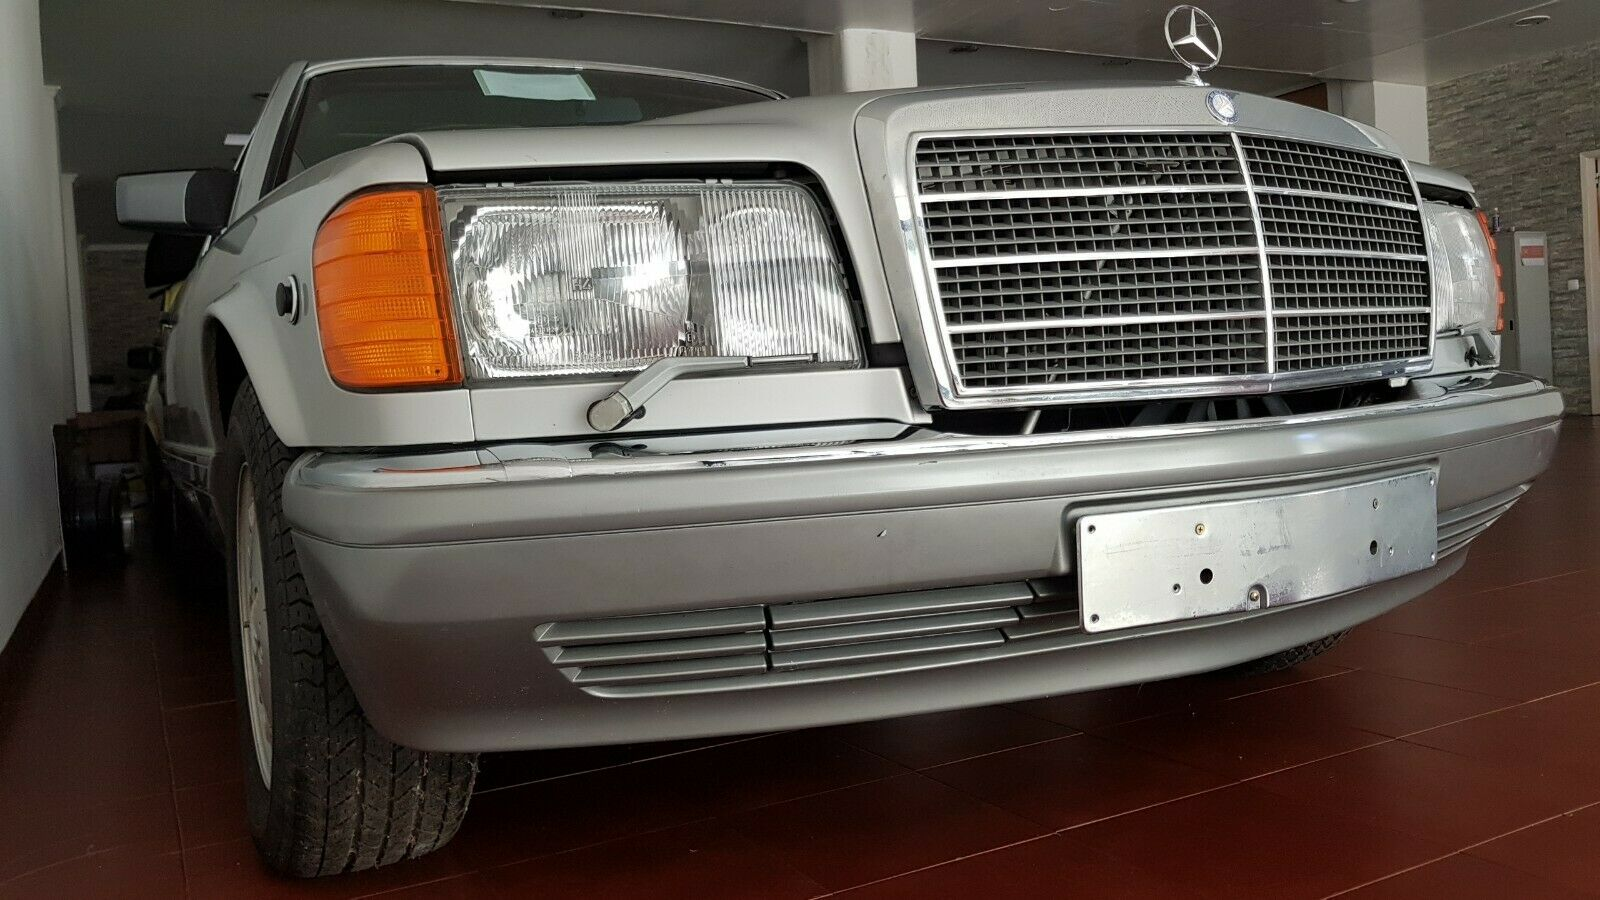 Na prodaju Mercedes-Benz 560 SEL u mint stanju! (GALERIJA)